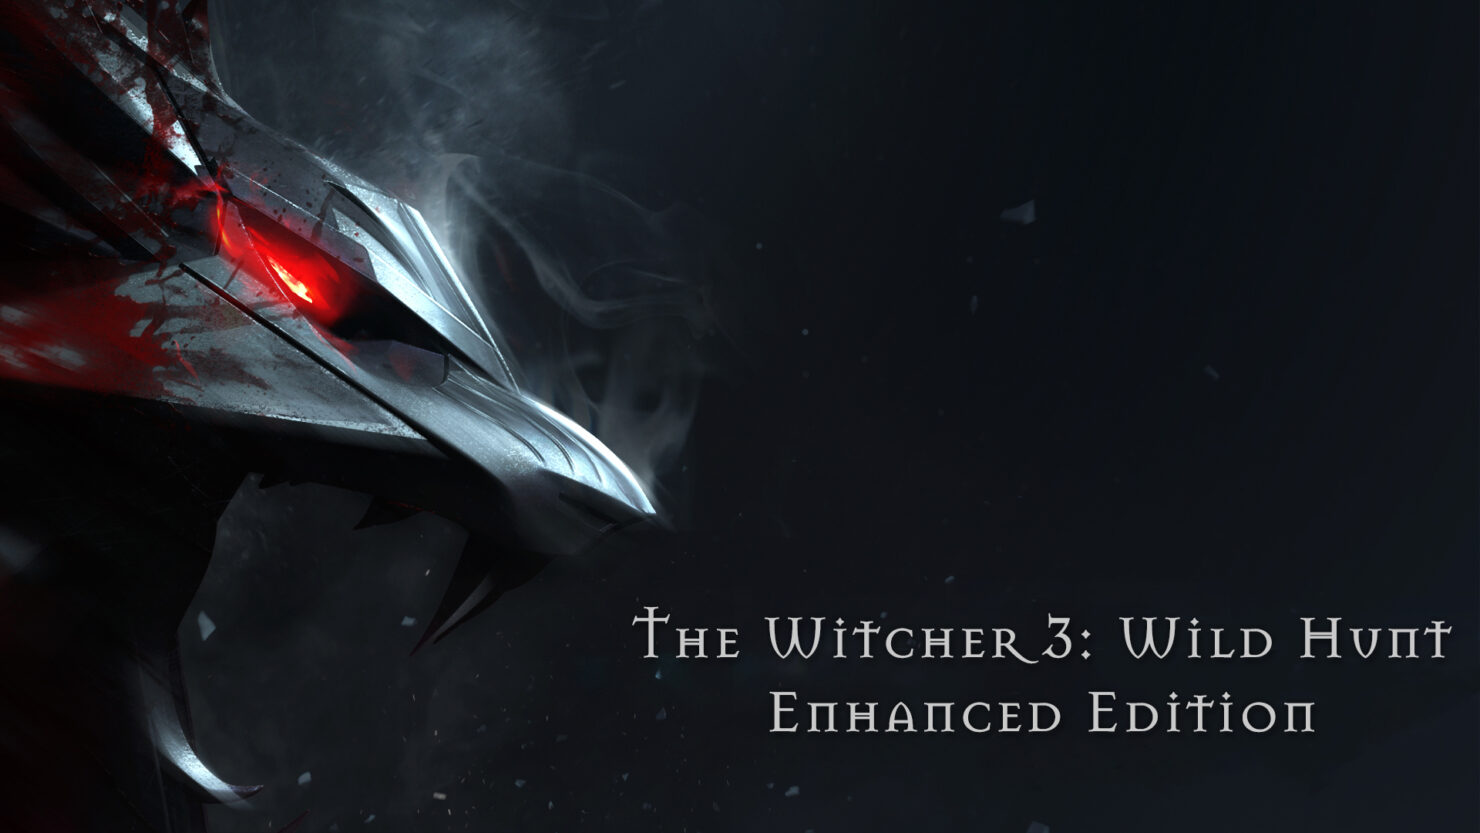 Witcher 3 Less Hardcore enhanced edition mod